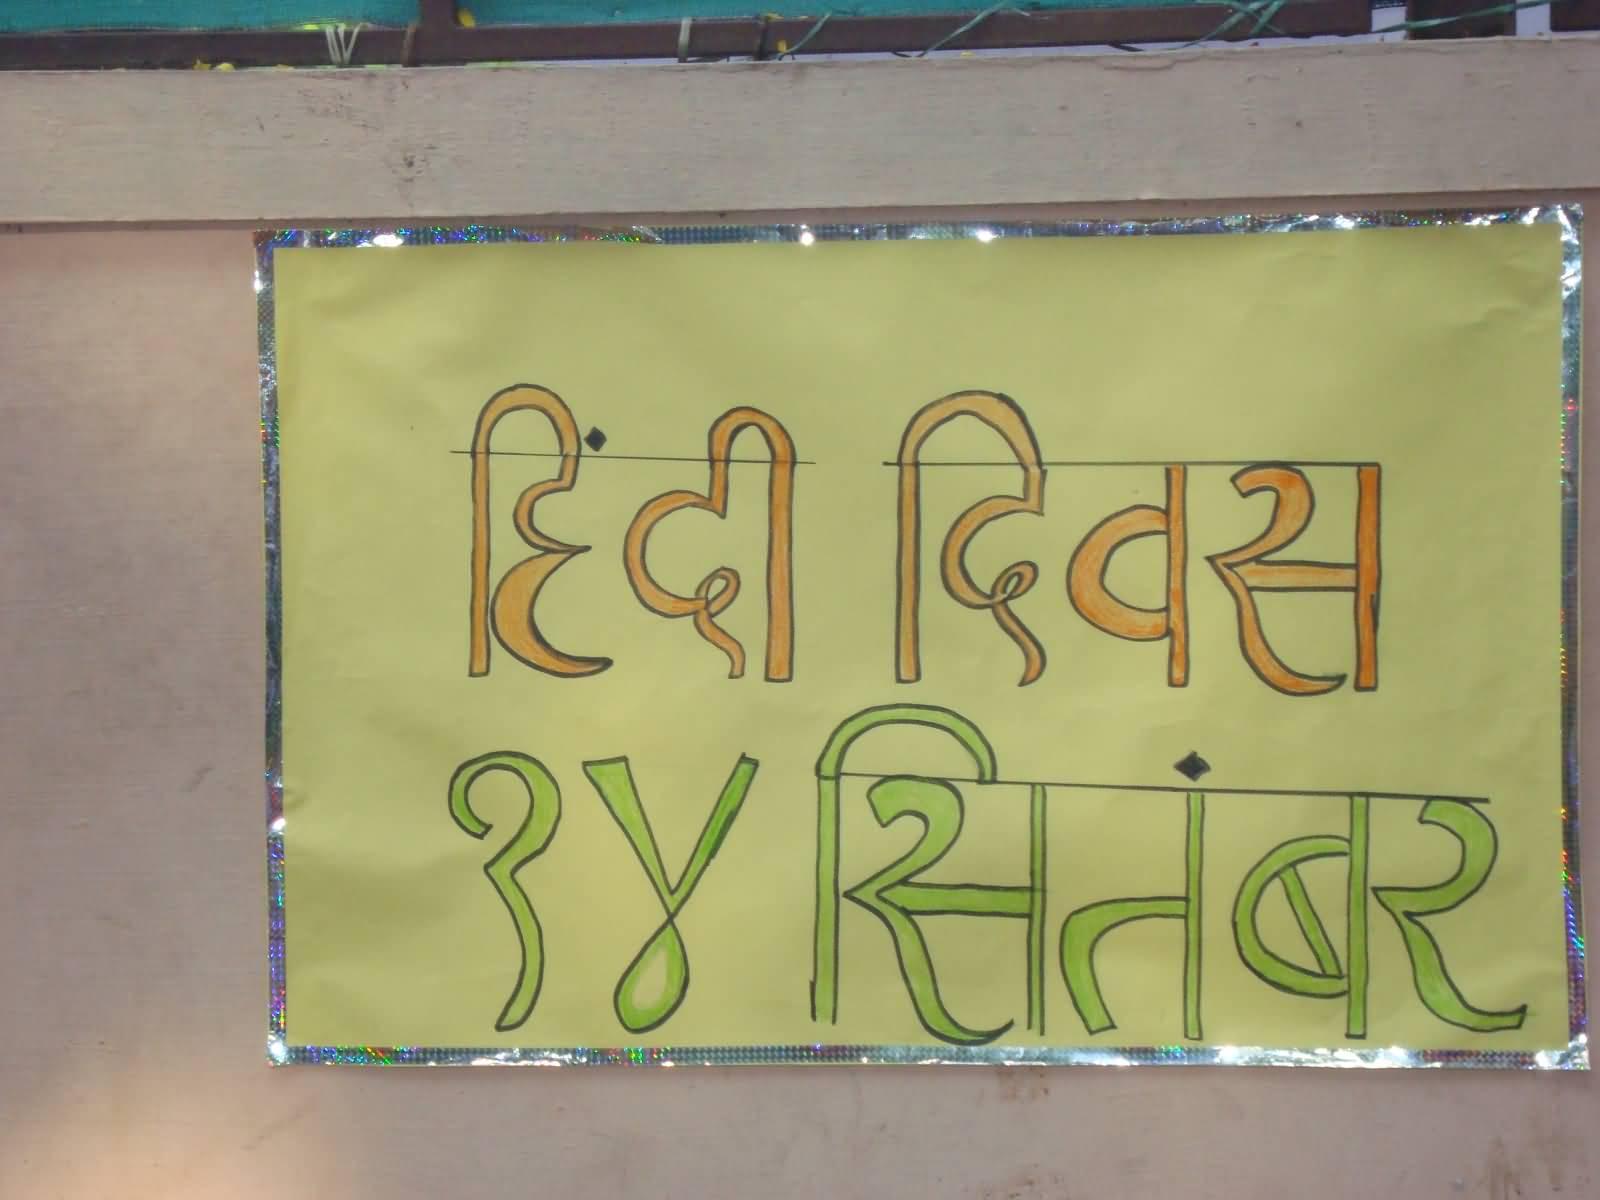 rajbhasha hindi diwas 14 september Hindi-rance diwas: making a case to celebrate bhasha, not rajbhasha yogendra yadav today, september 14 is hindi diwas — an annual, soulless, sarkari ritual.